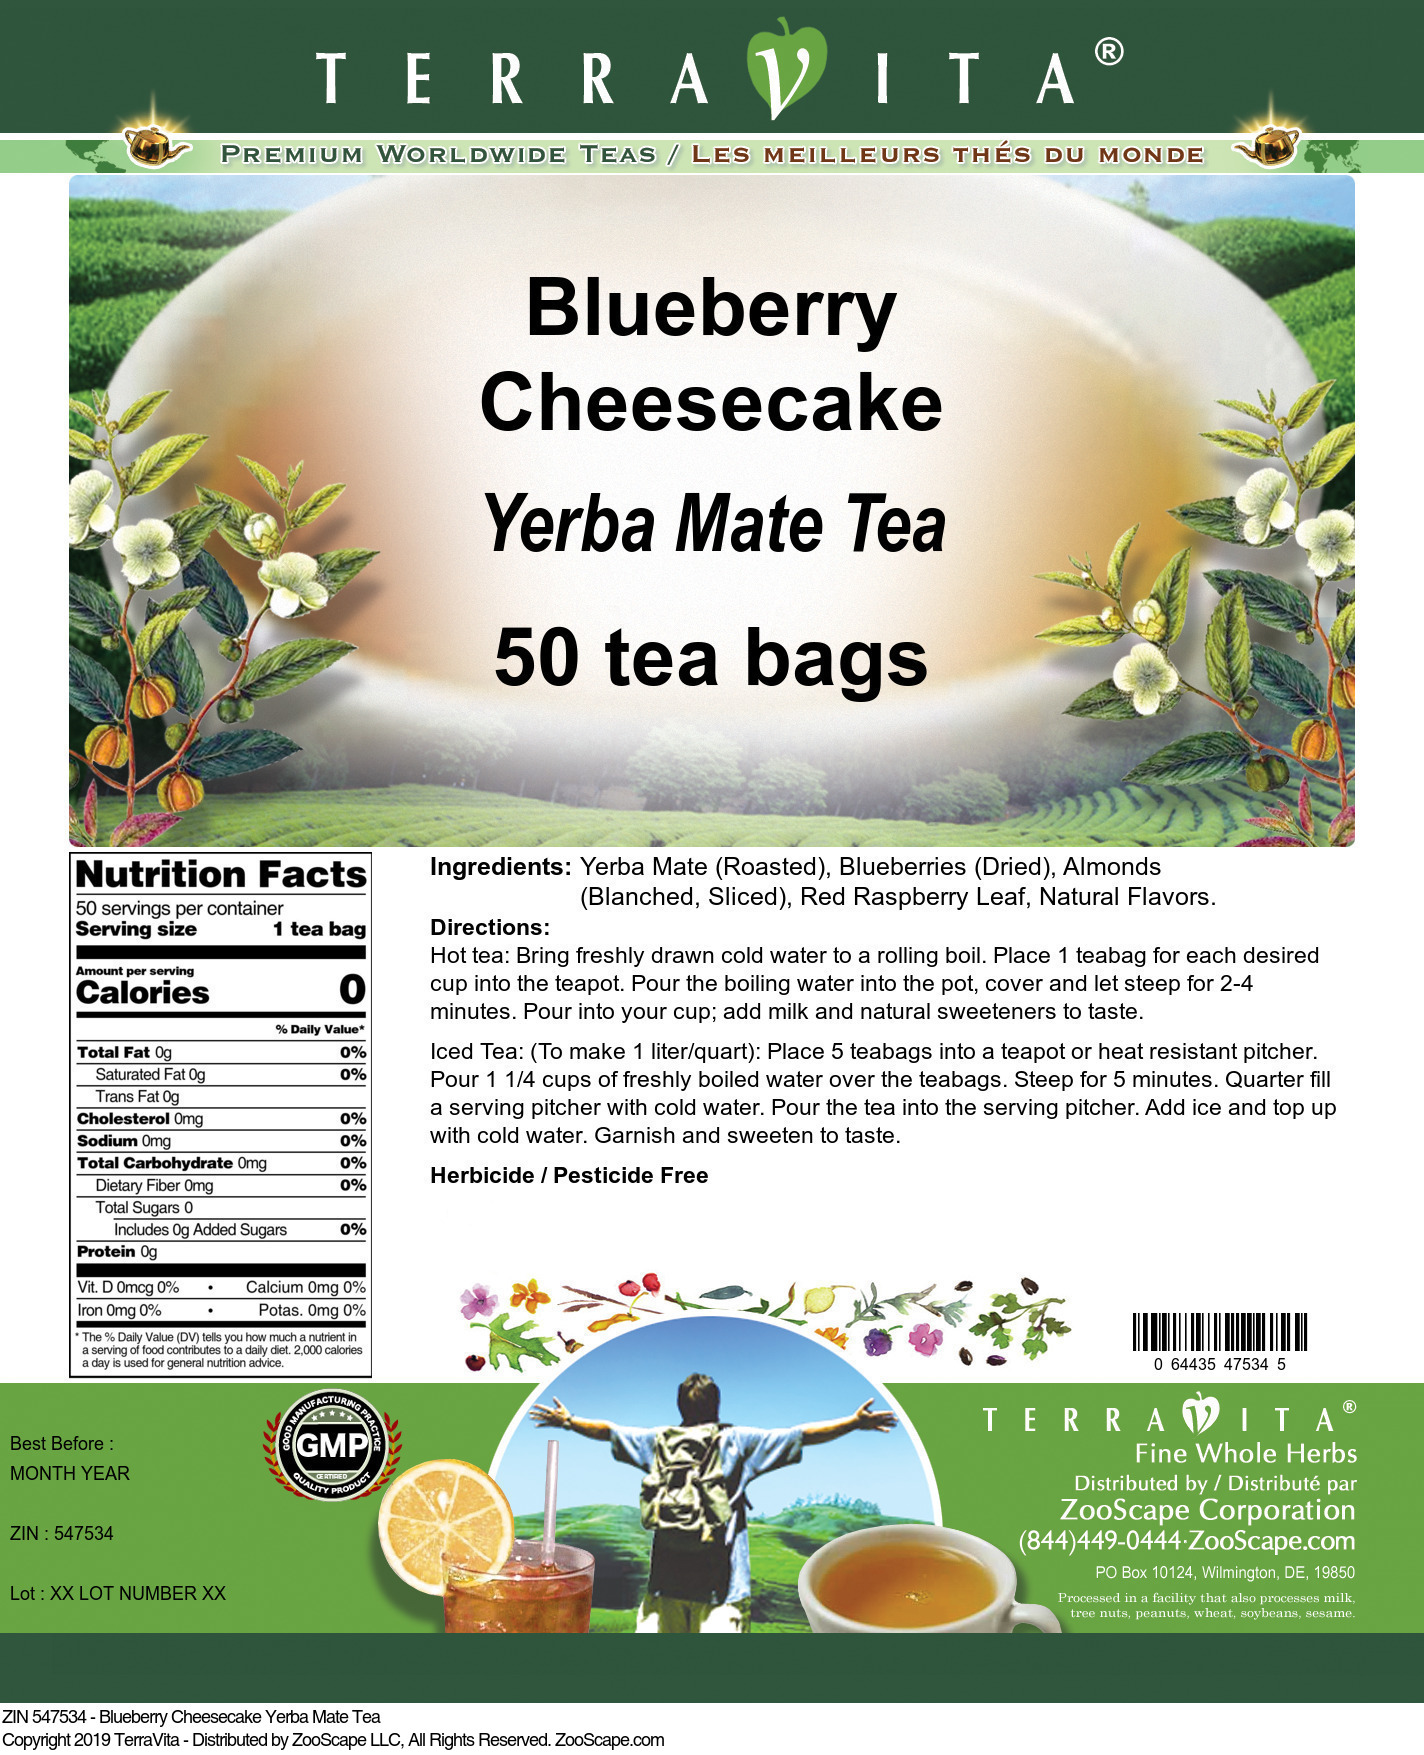 Blueberry Cheesecake Yerba Mate Tea